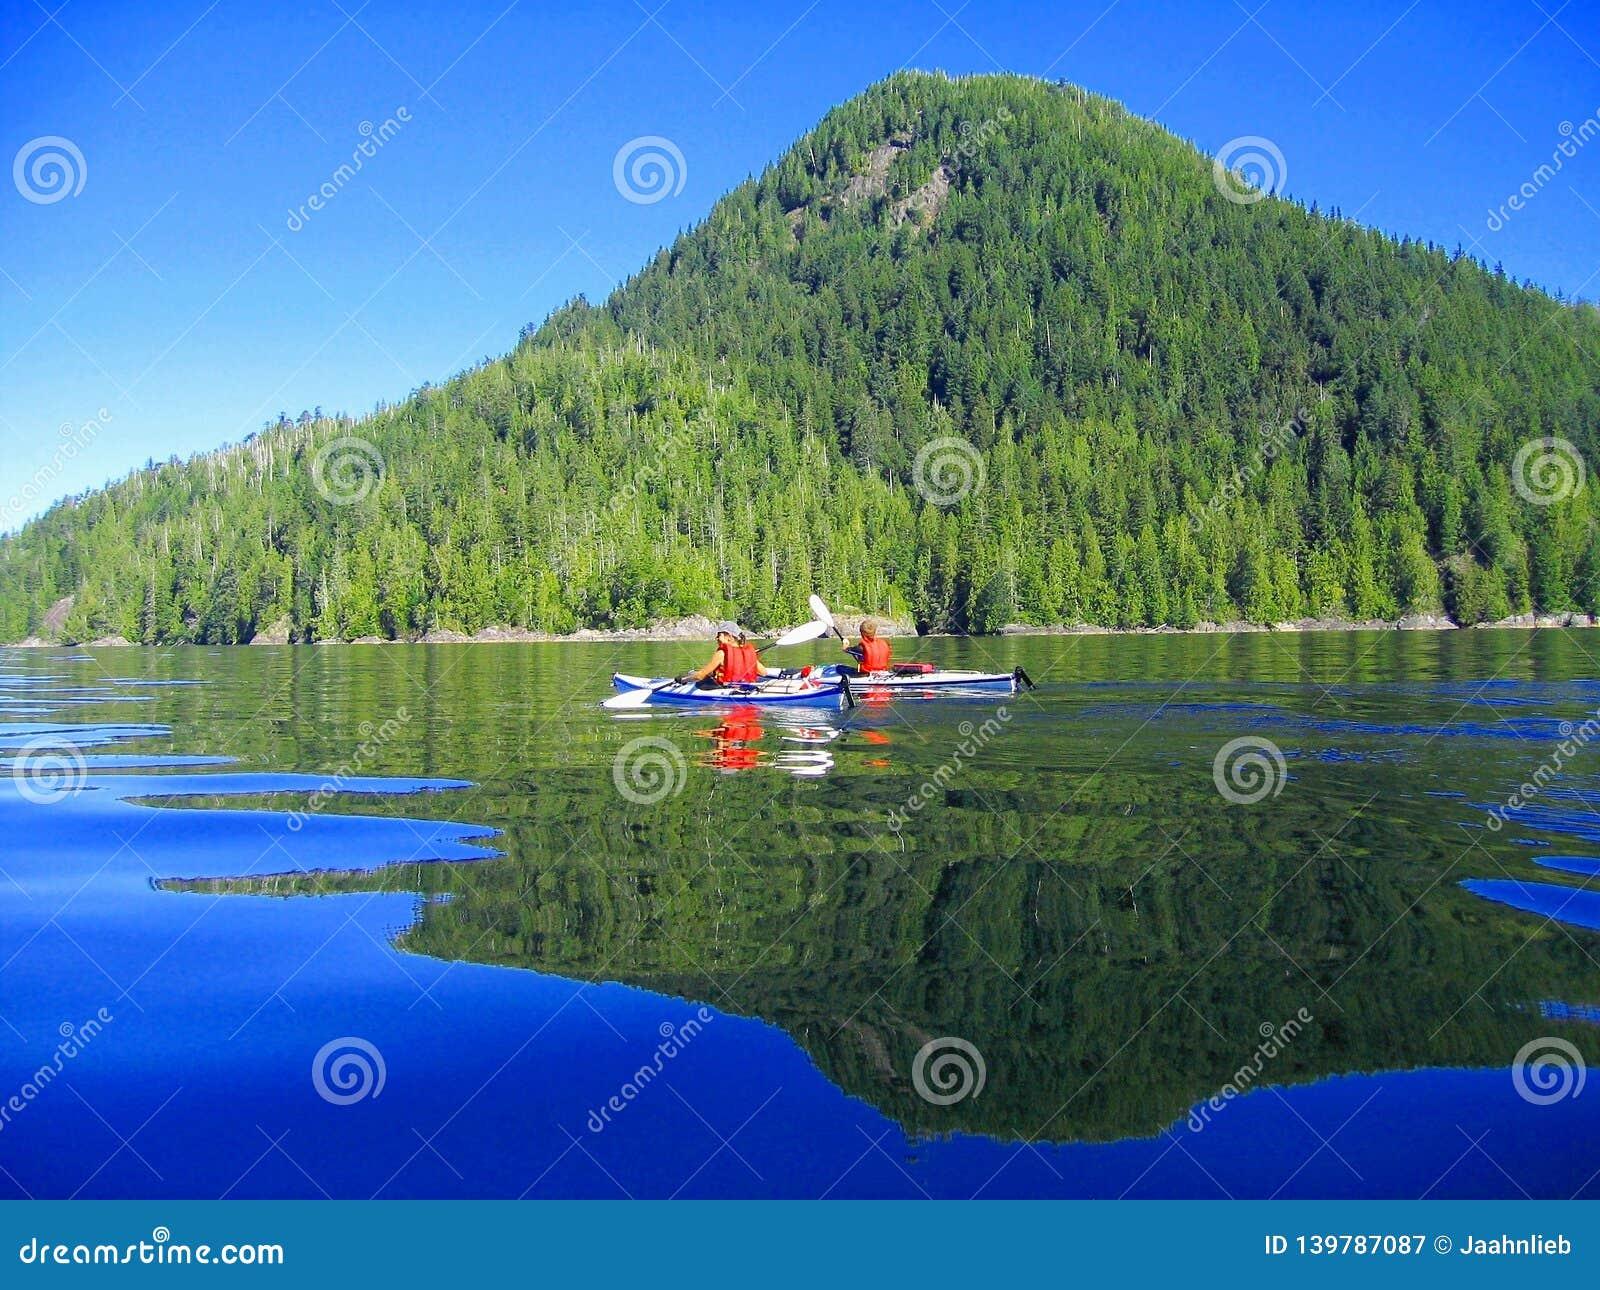 Kayaking in Calm Waters at McKay Island, Clayoquot Sound north of Tofino, British Columbia